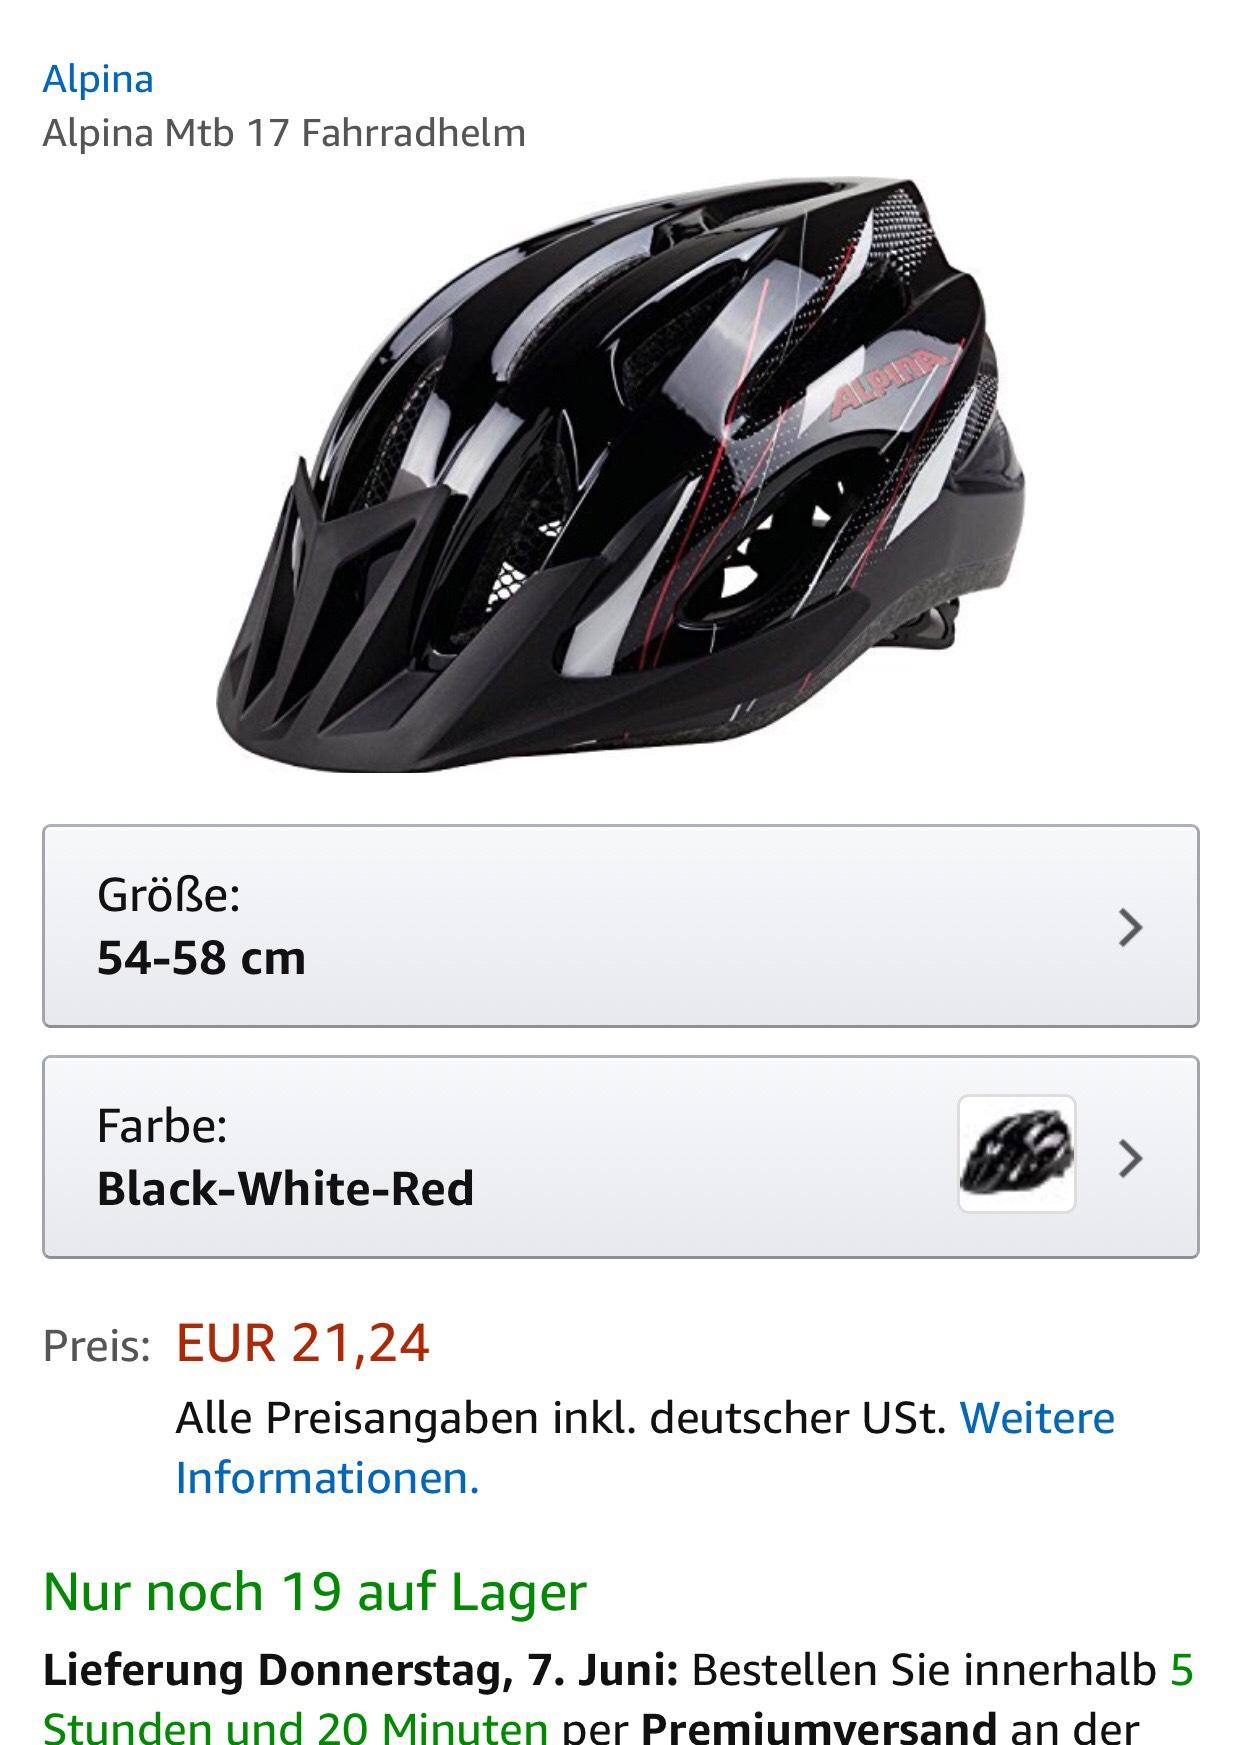 [Amazon, Prime?] Alpina Mtb Fahrradhelm - kleinere Größe 54-58 cm